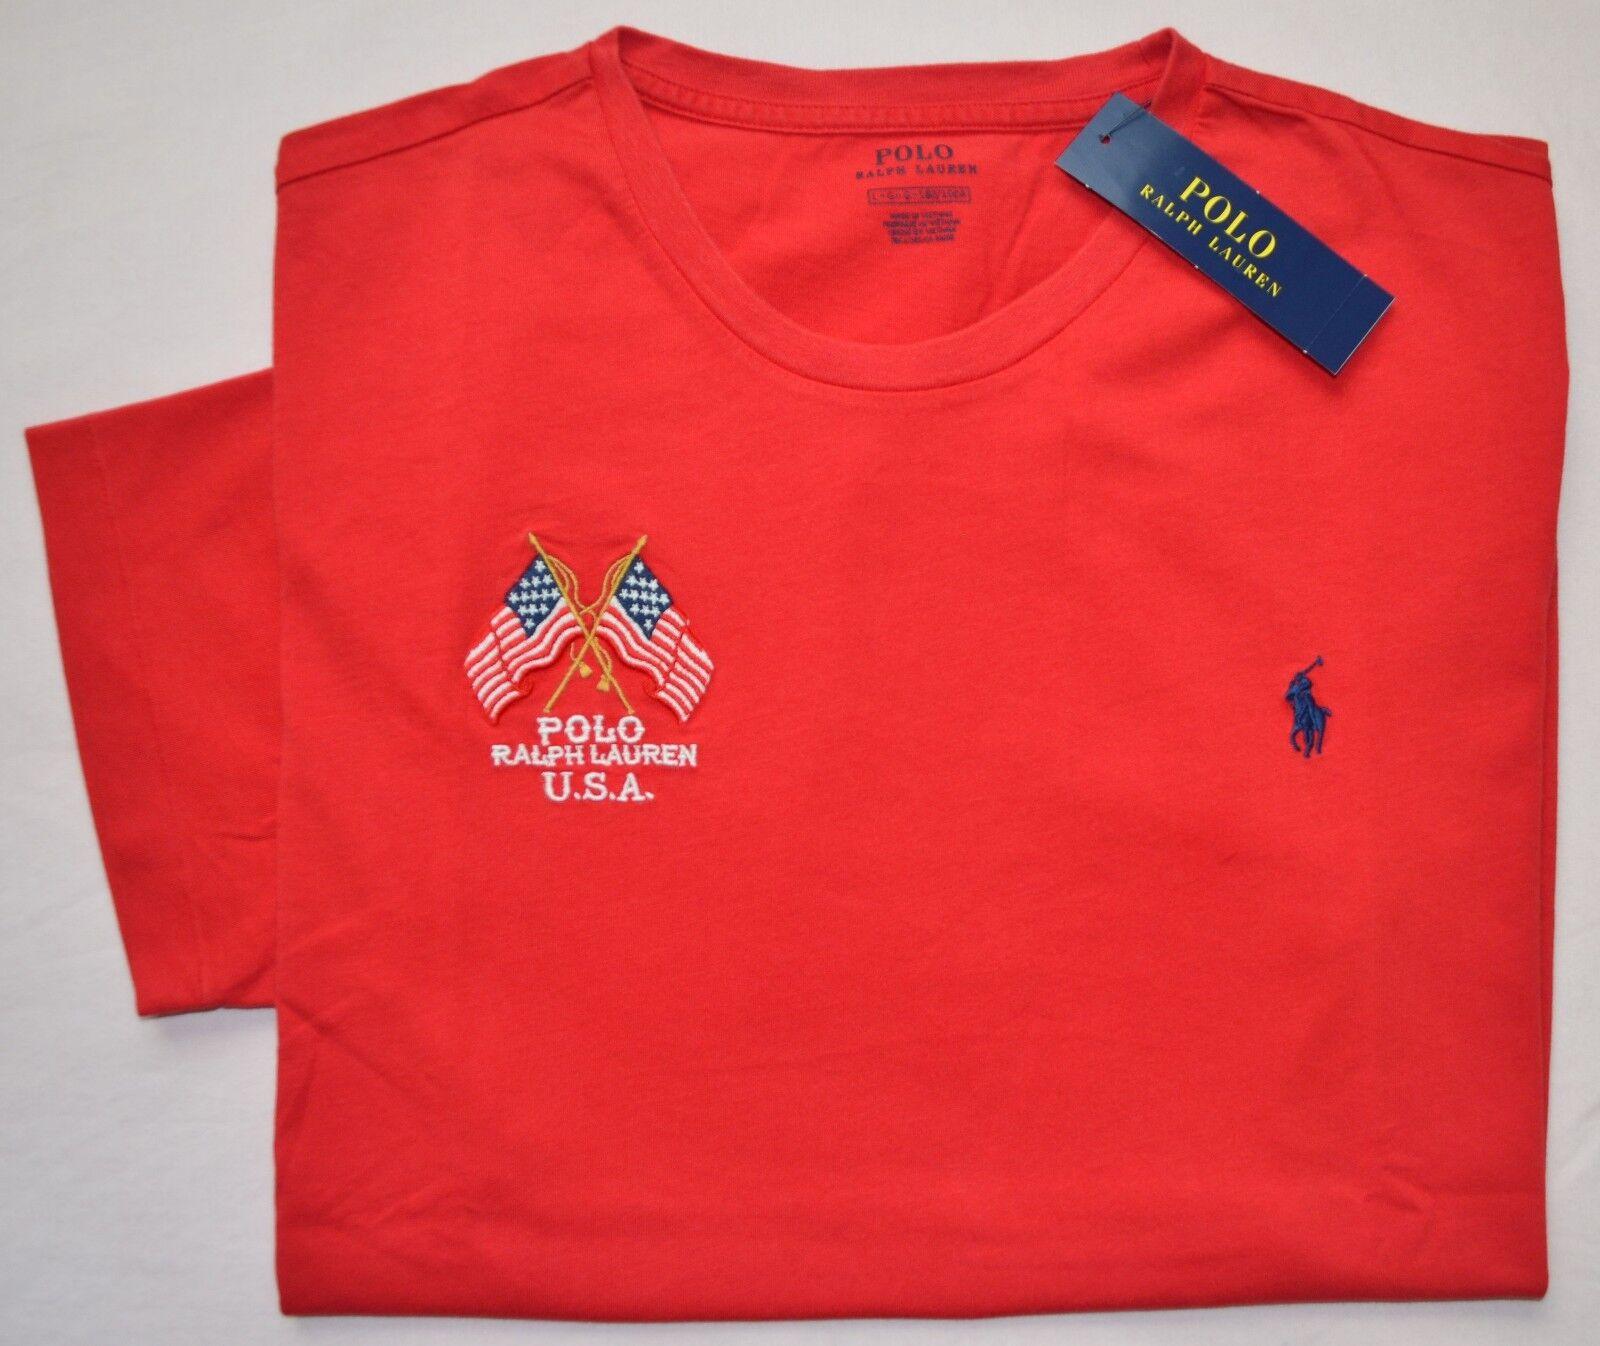 Neu Groß Polo Ralph Lauren Herren American Us Flagge T-Shirt Rundhals Rot Top